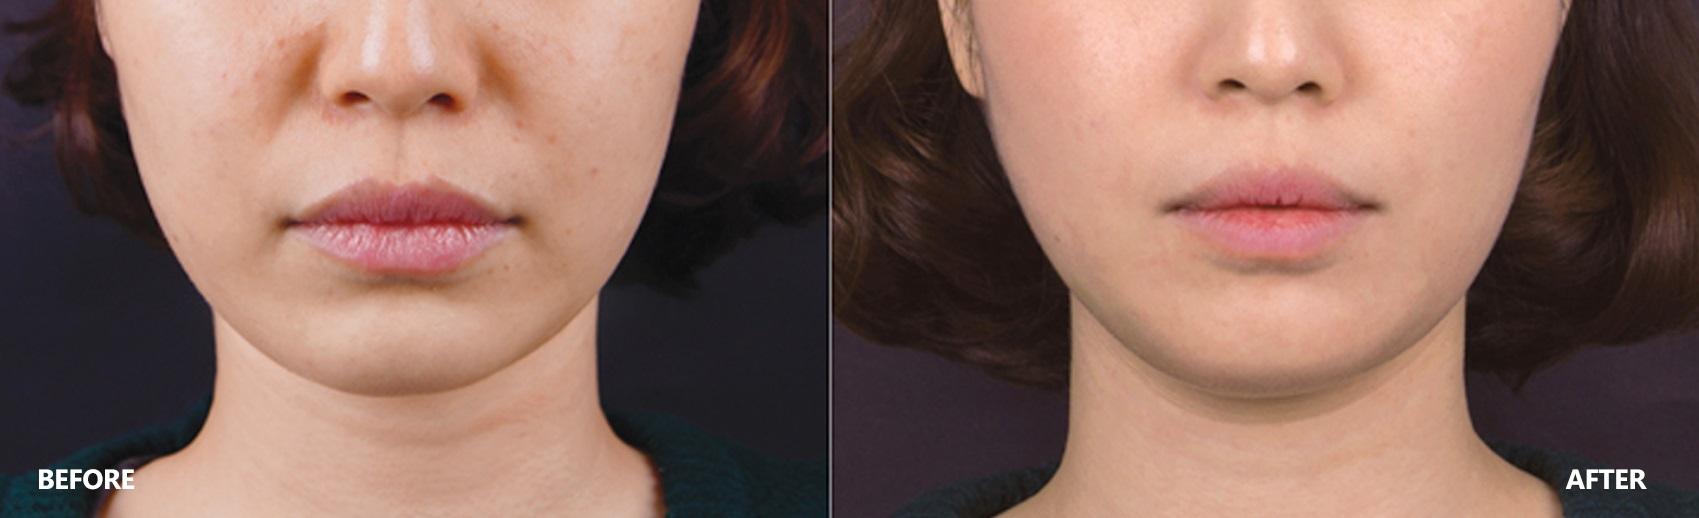 skin-lifting-result-5